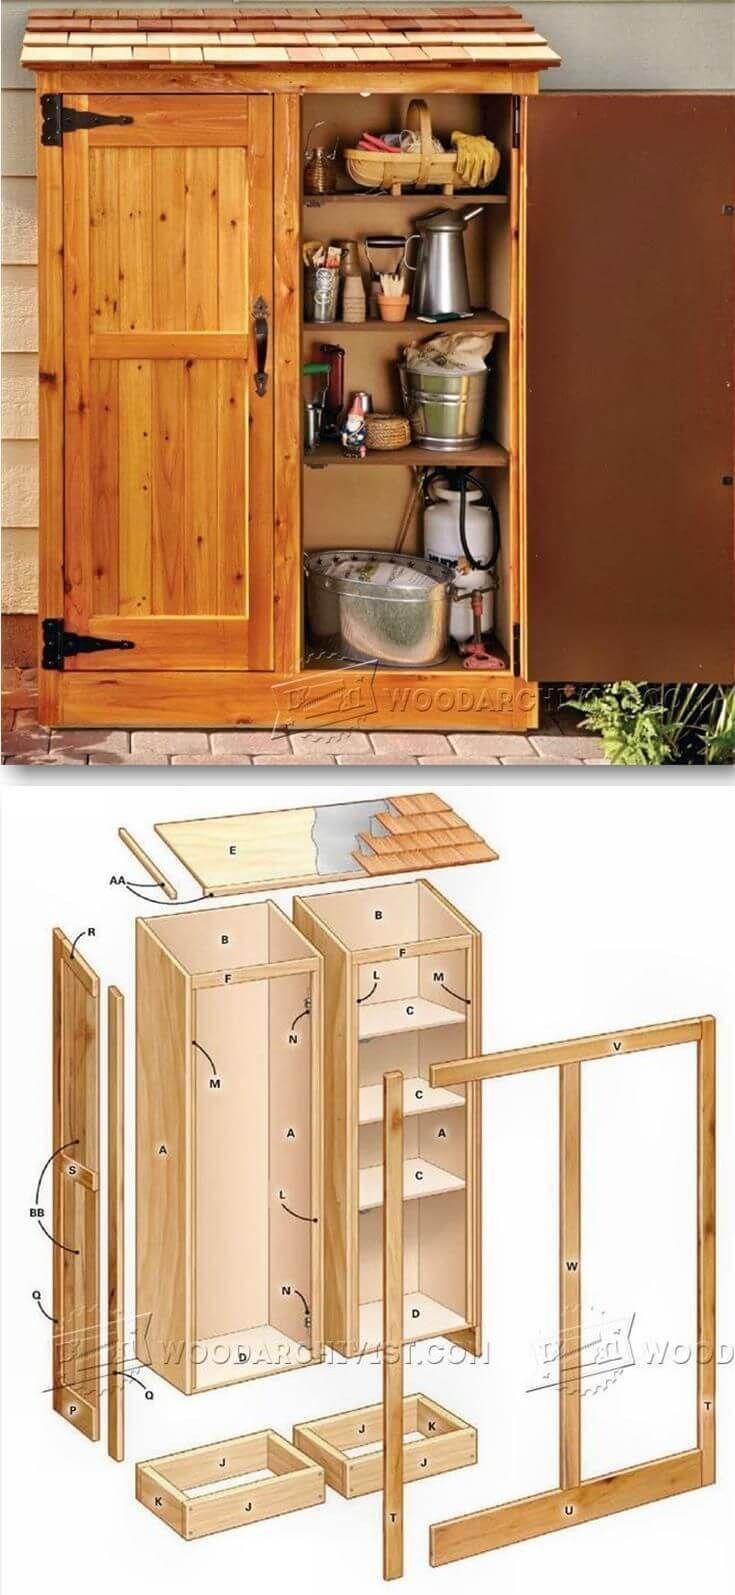 Small shop storage ideas